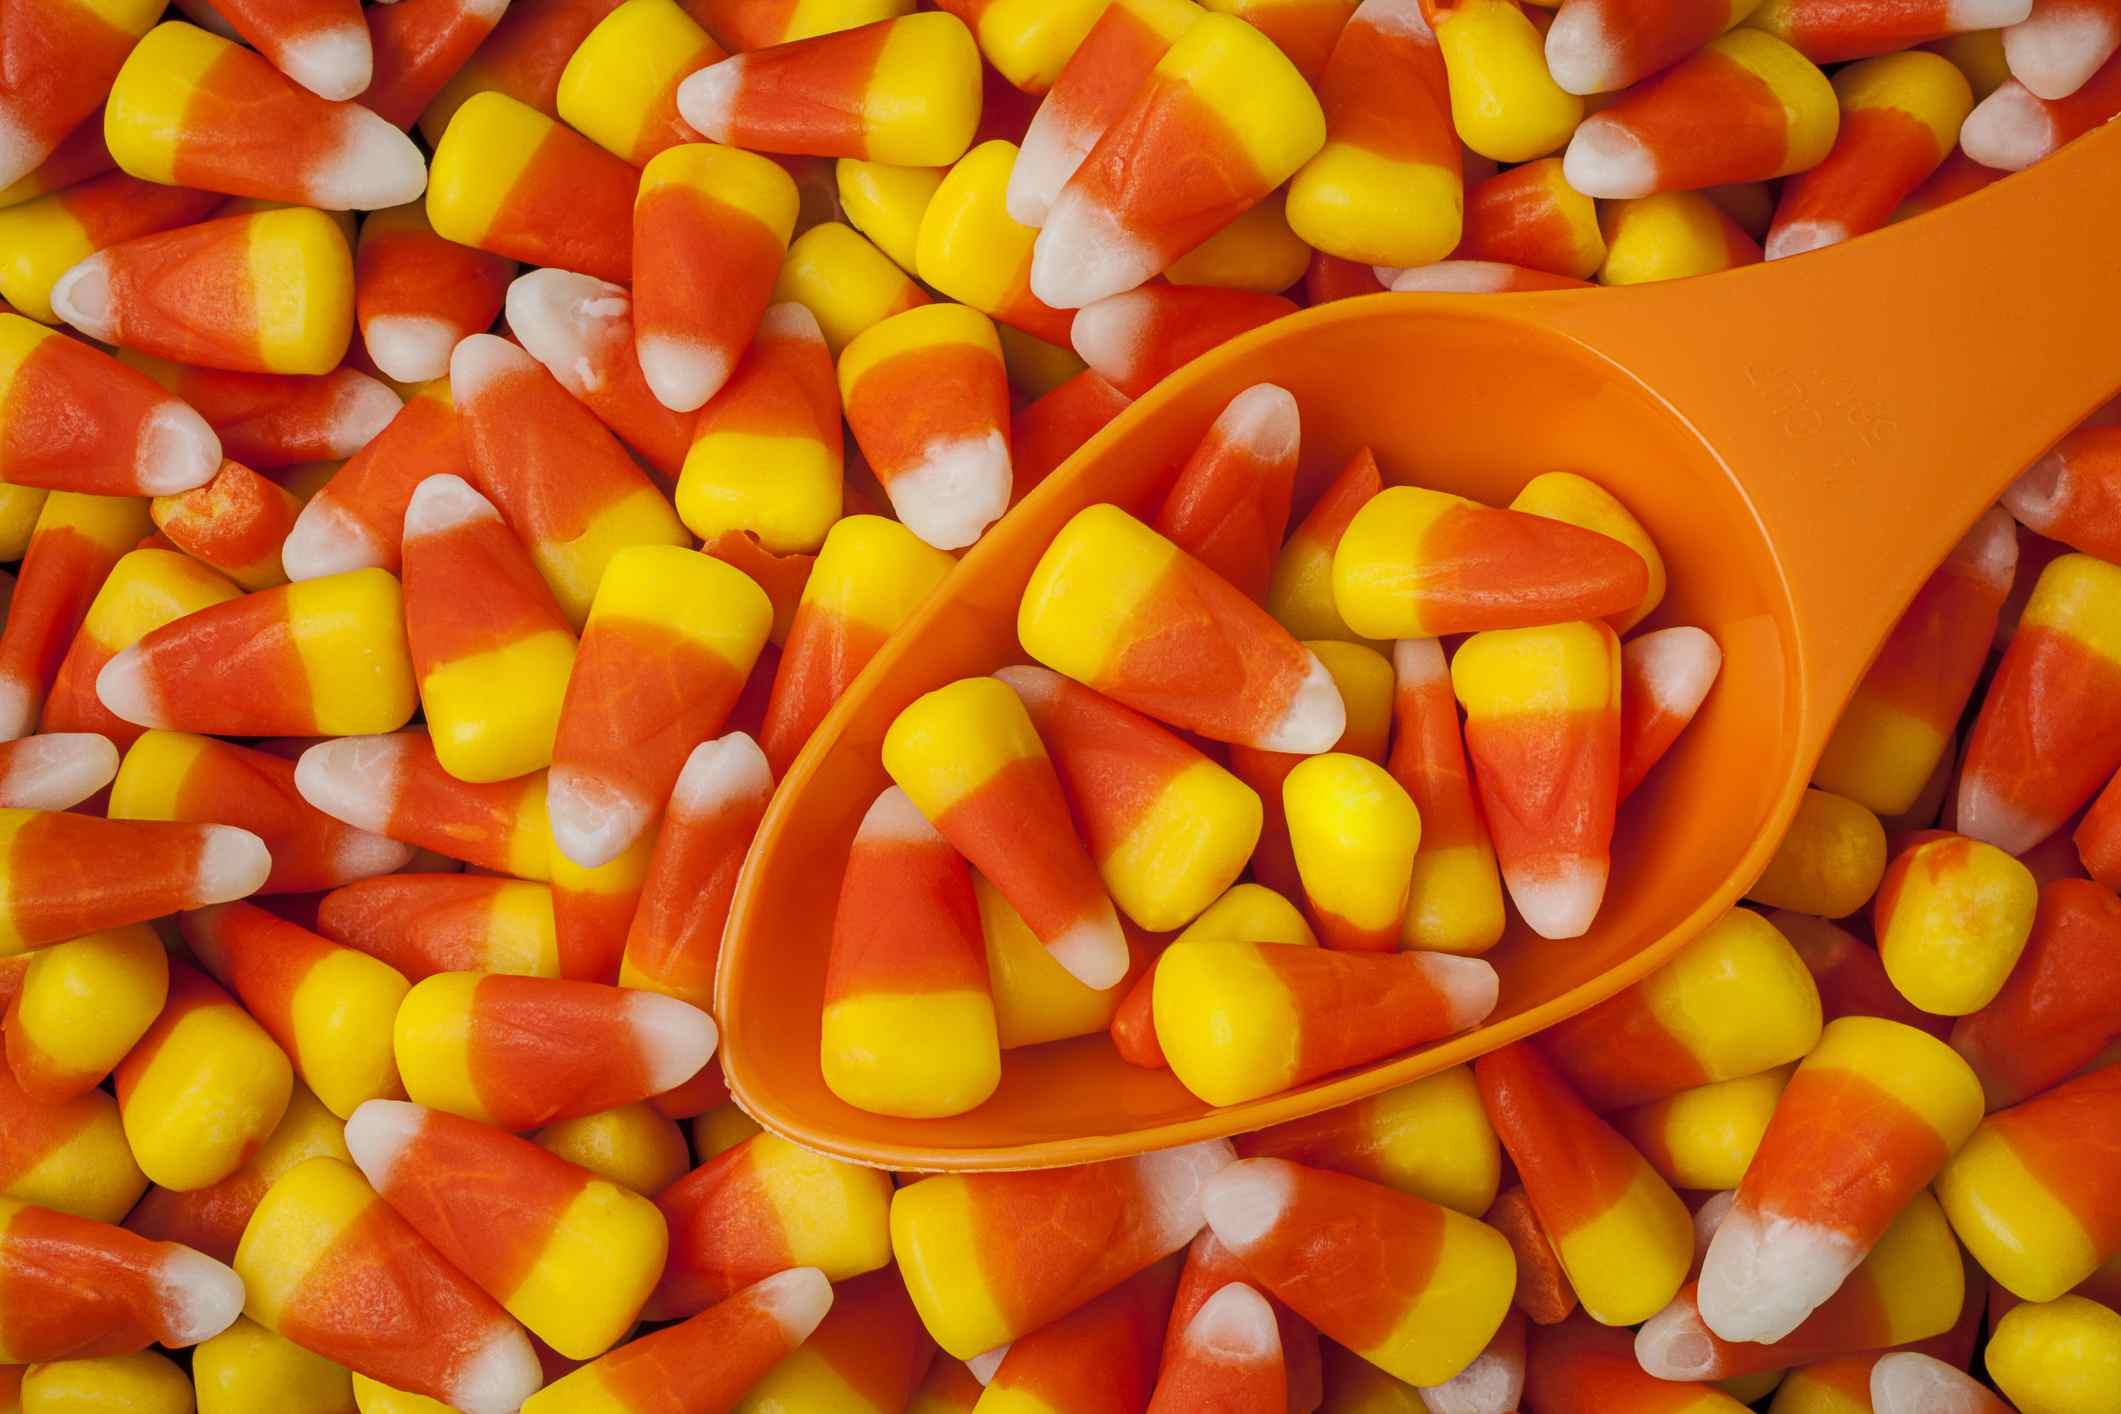 Maíz dulce y cucharada de naranja